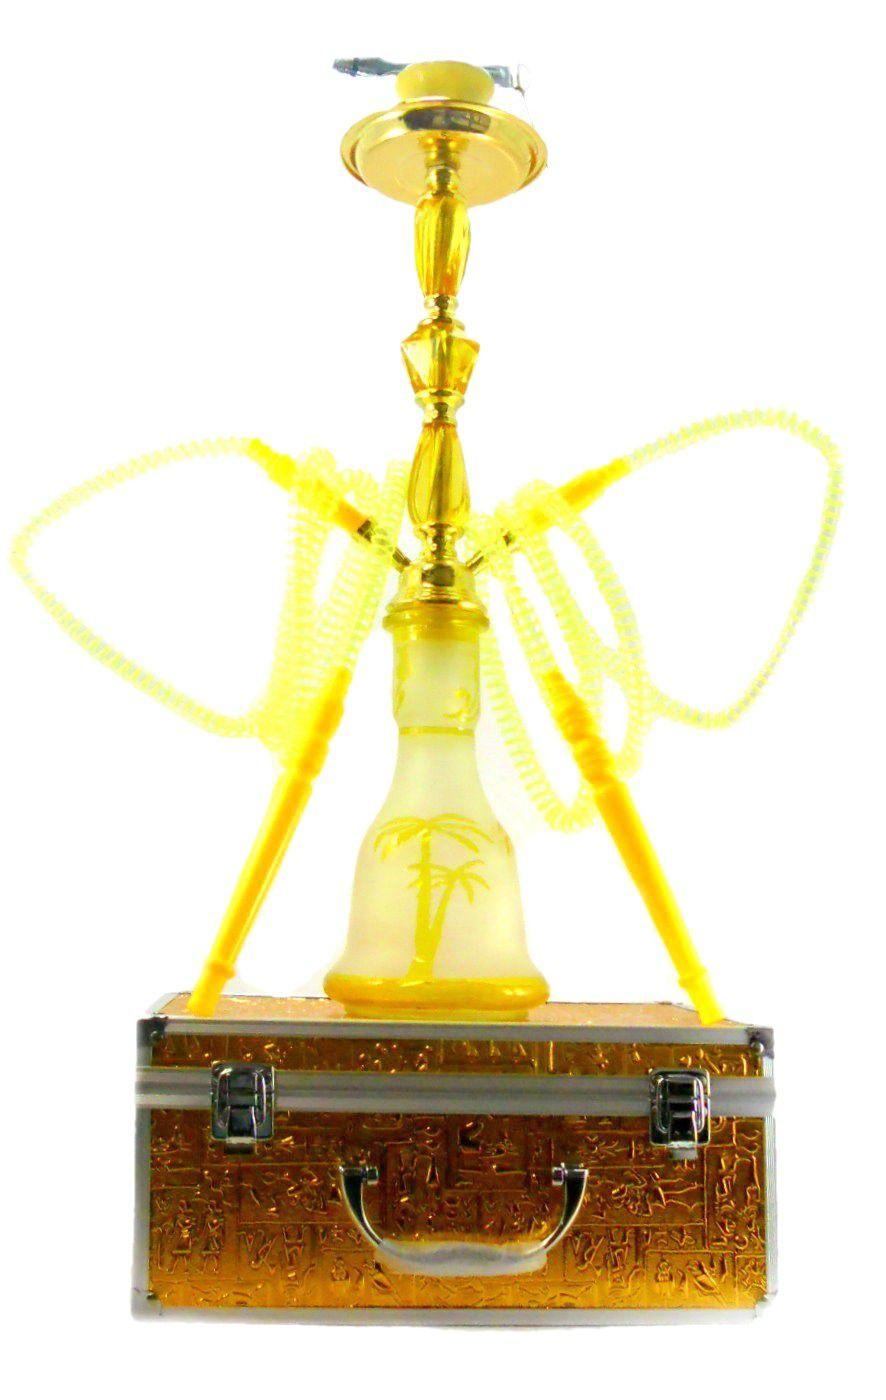 Narguile MD Hookah 55cm C/ MALETA. Duas mangueiras, vidro AMARELO jateado, corpo dourado AB542SMALAM